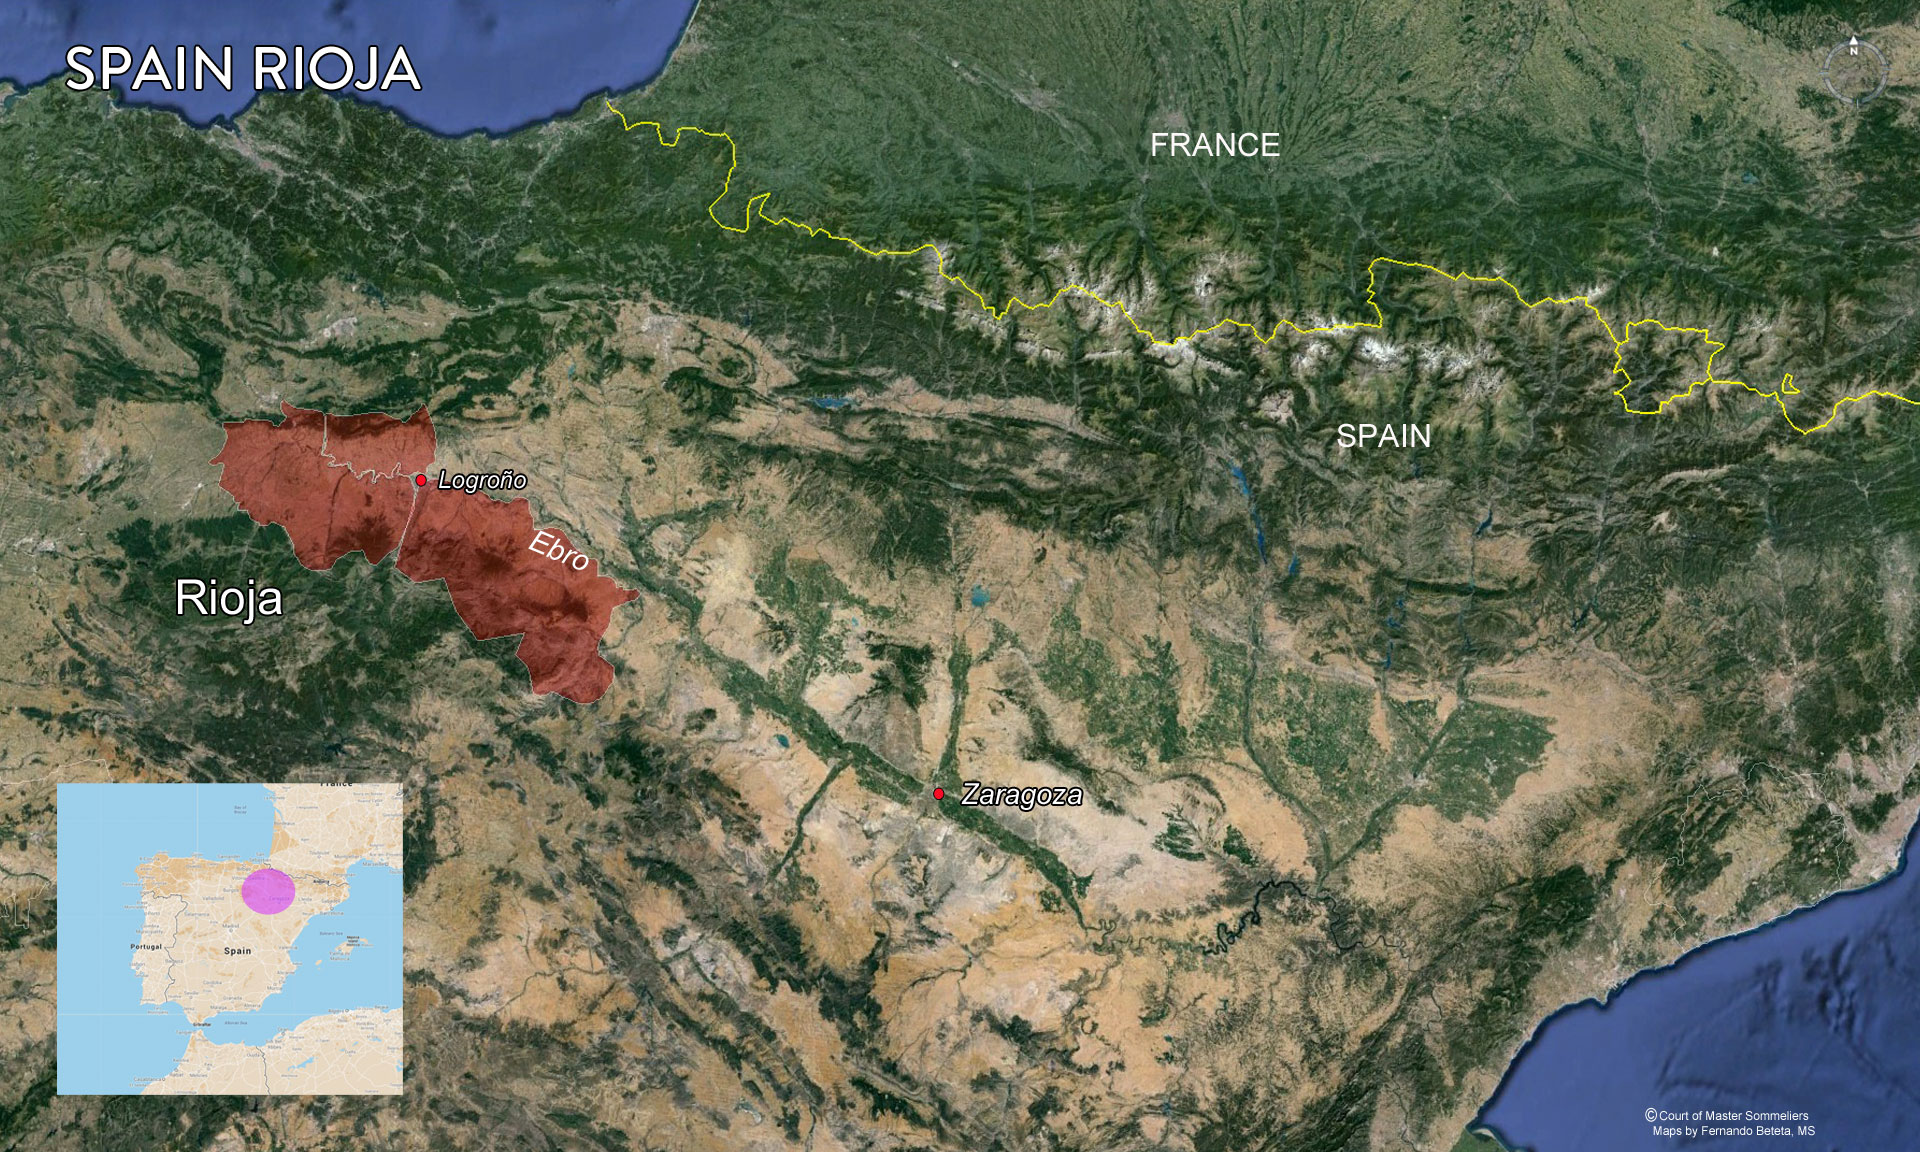 Spain-Rioja-Overview.jpg